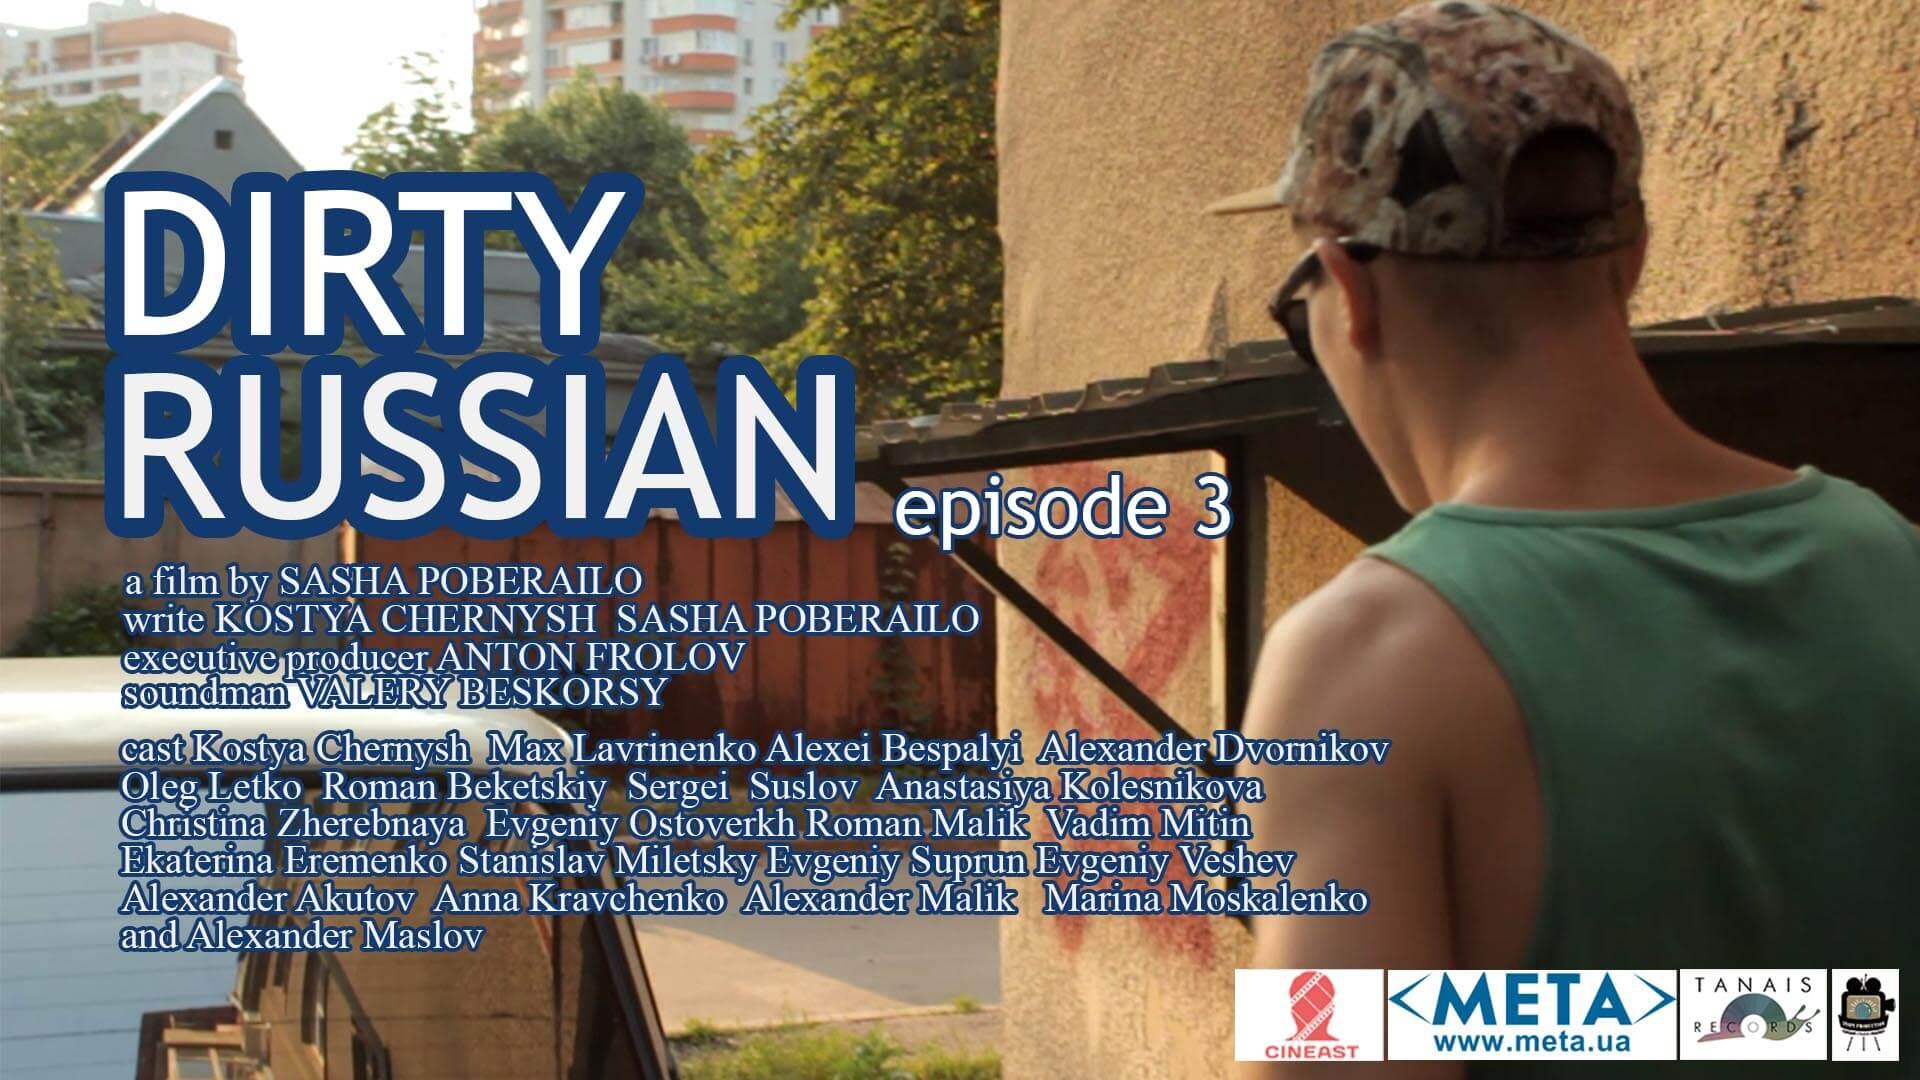 dirty russian episode 3 - filmmaking